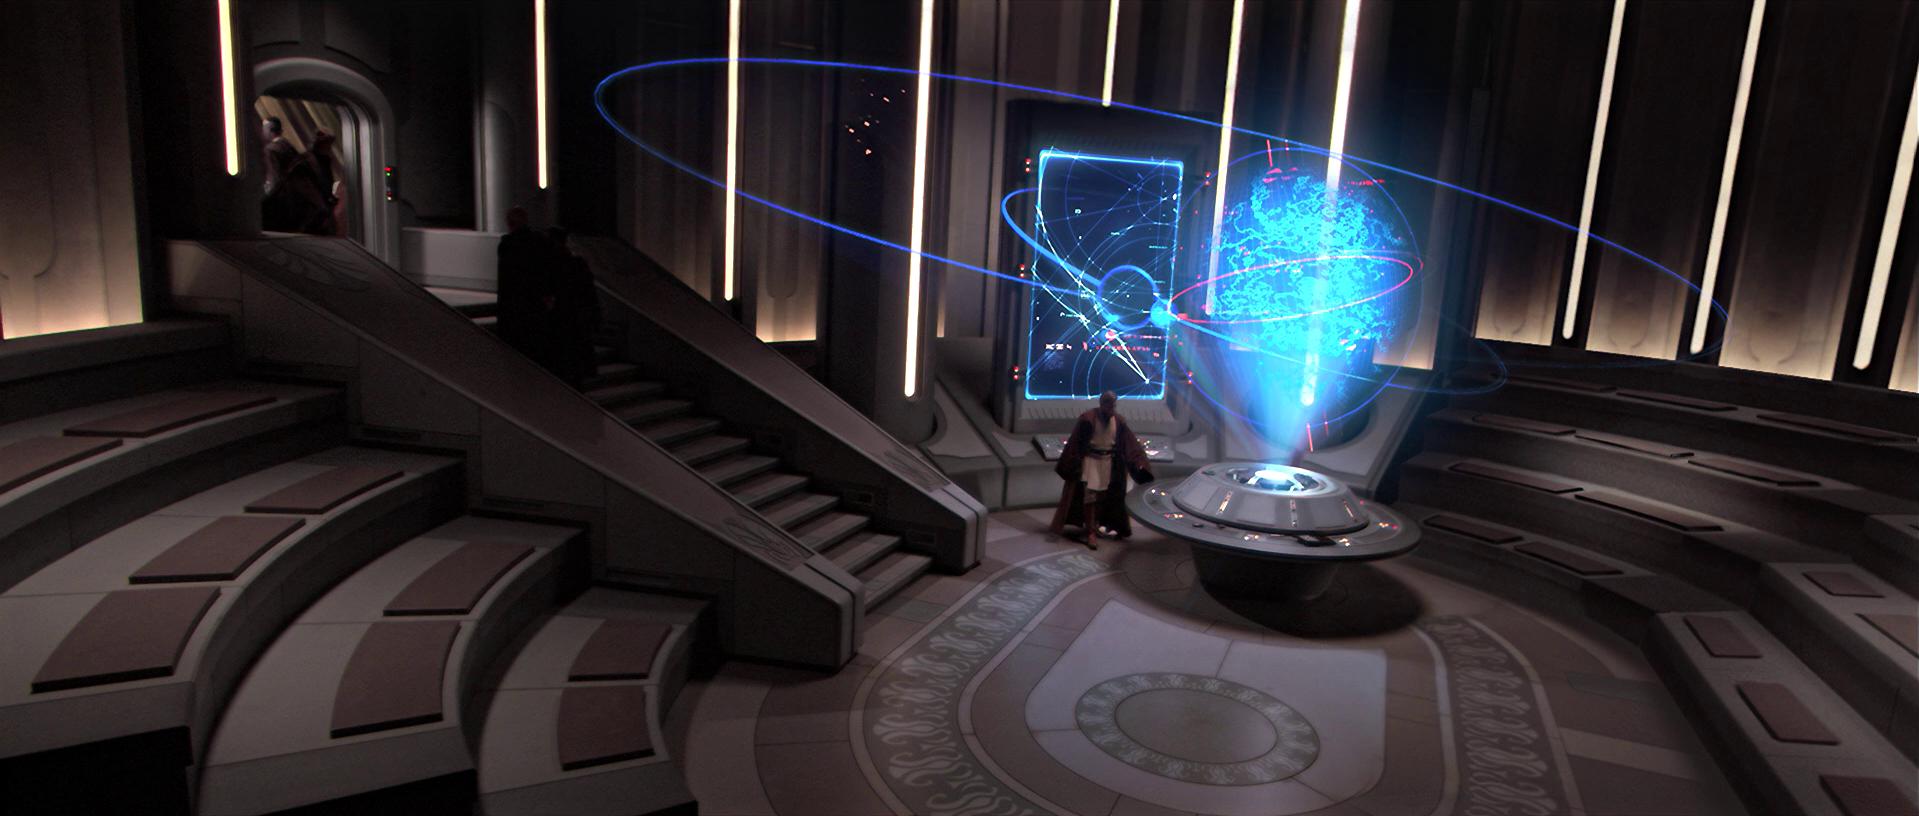 Jedi Temple Communication Center Wookieepedia Fandom